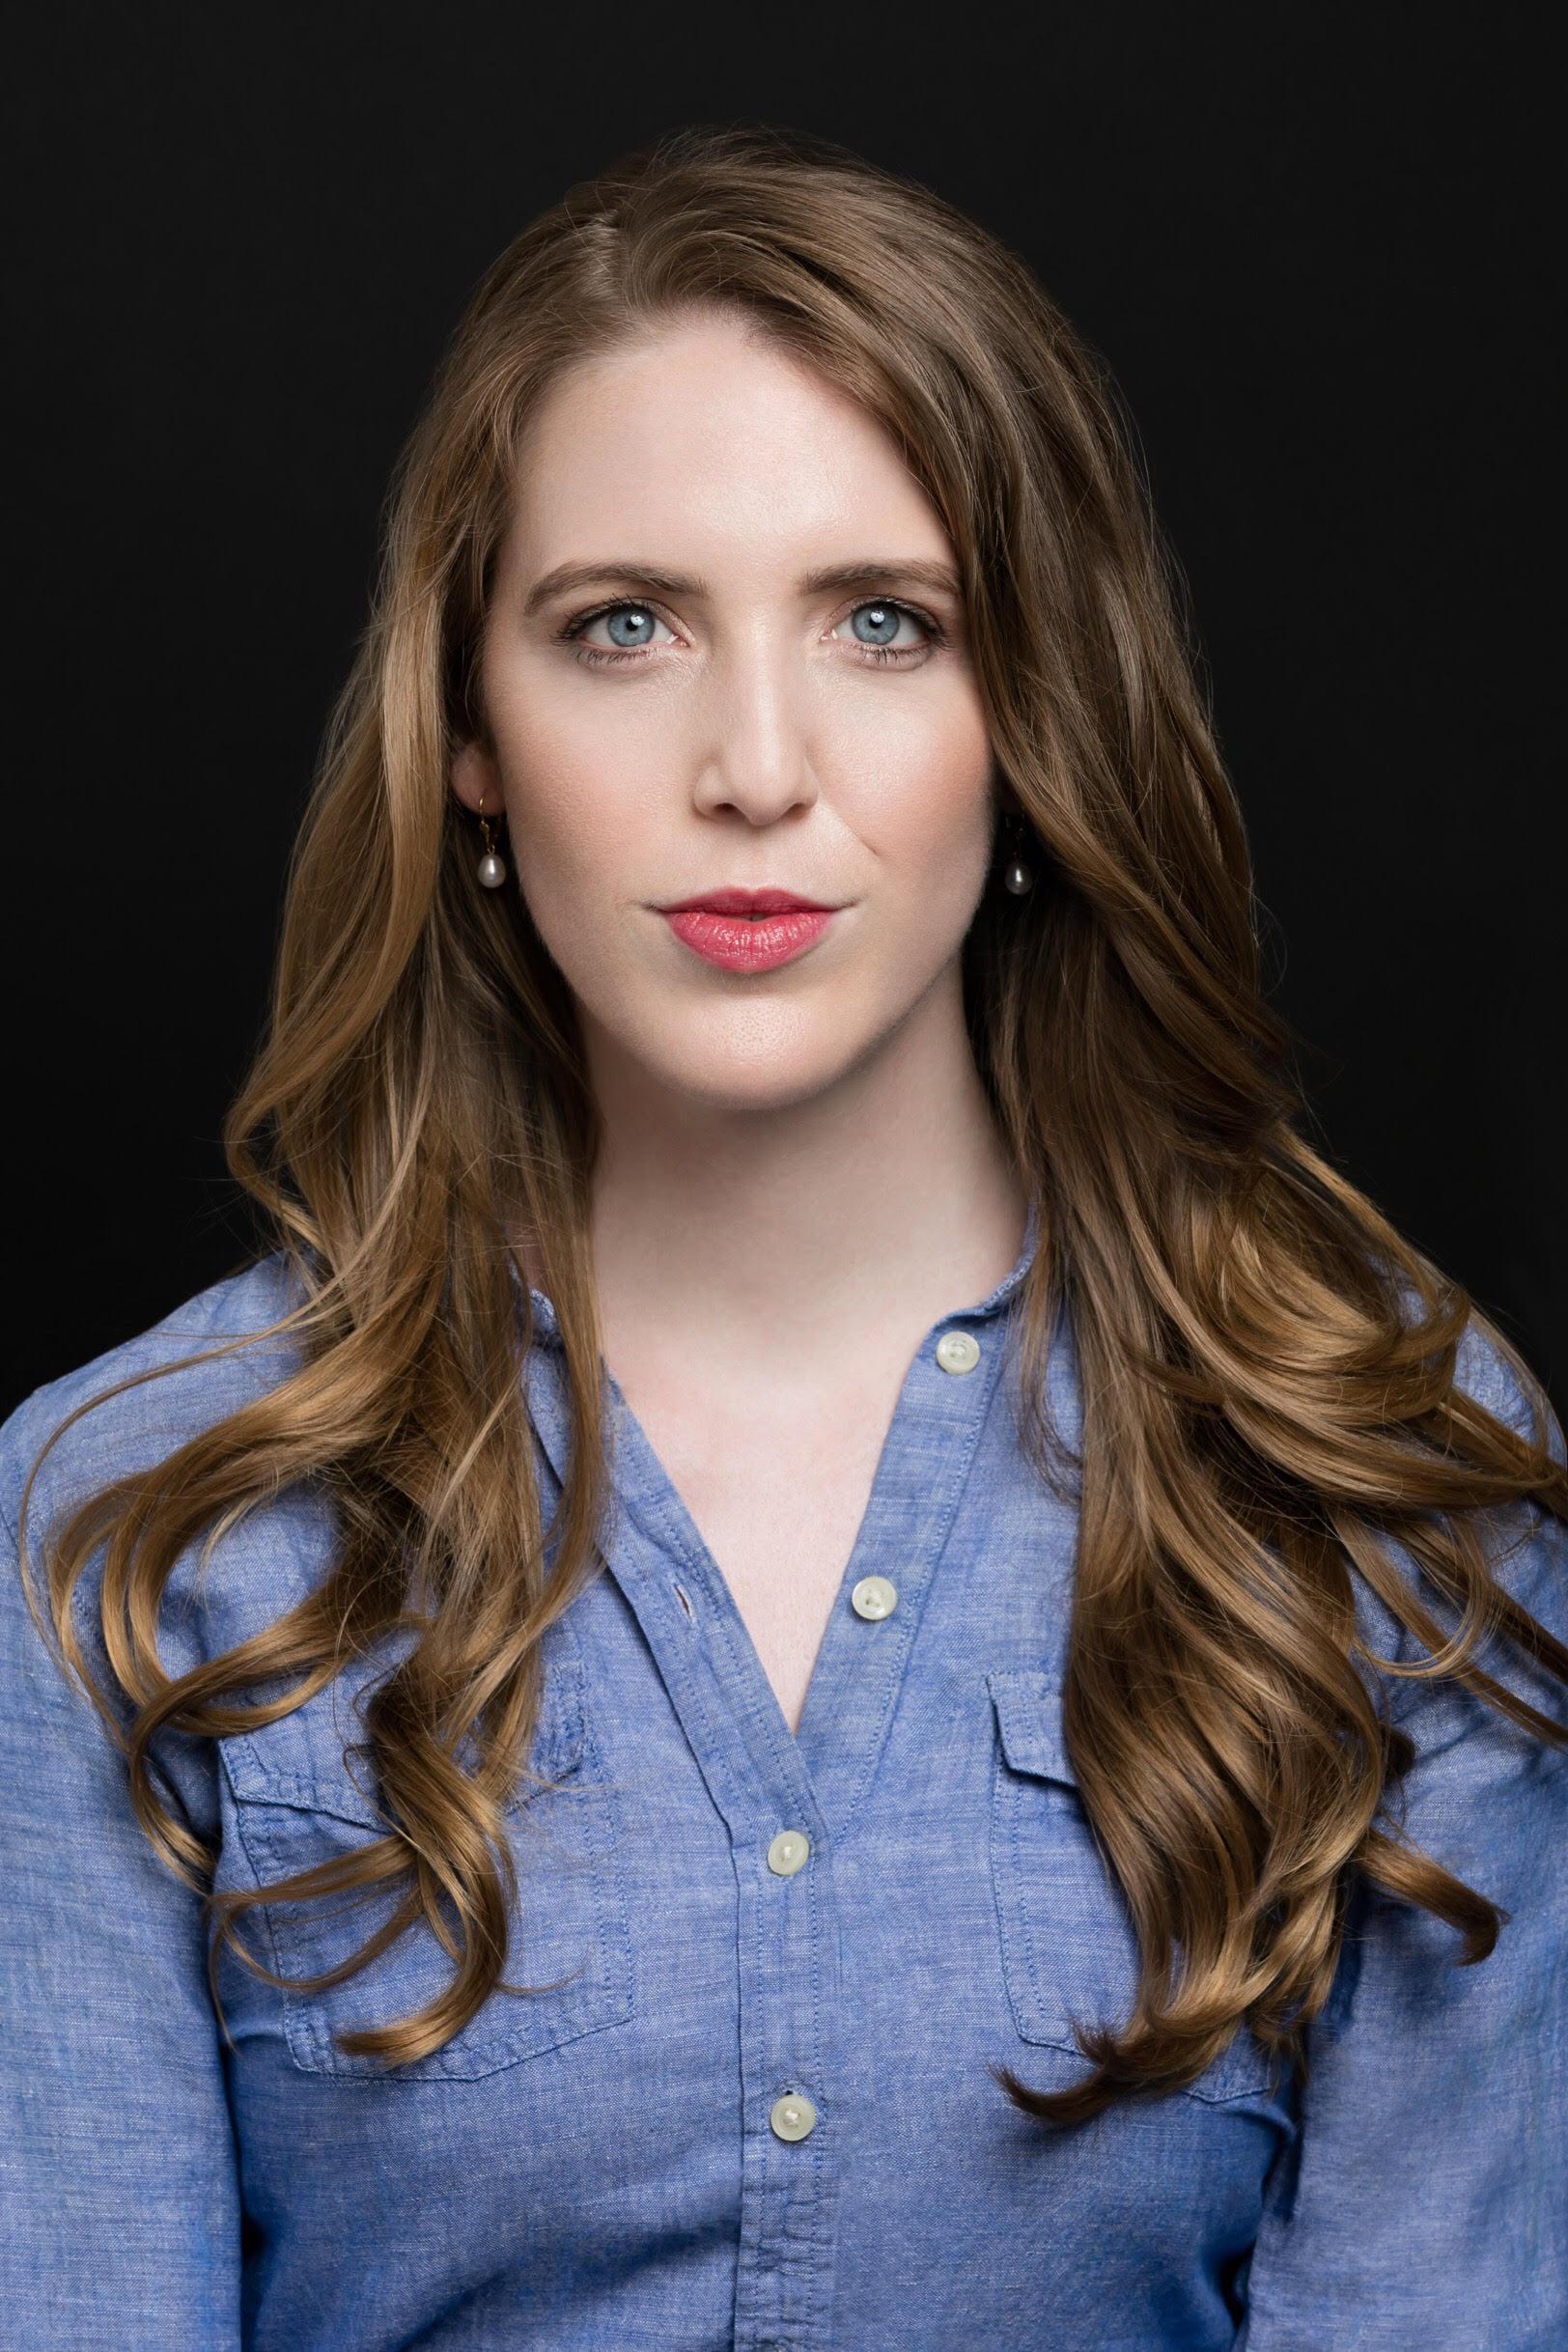 Jessica Pearce Rotondi